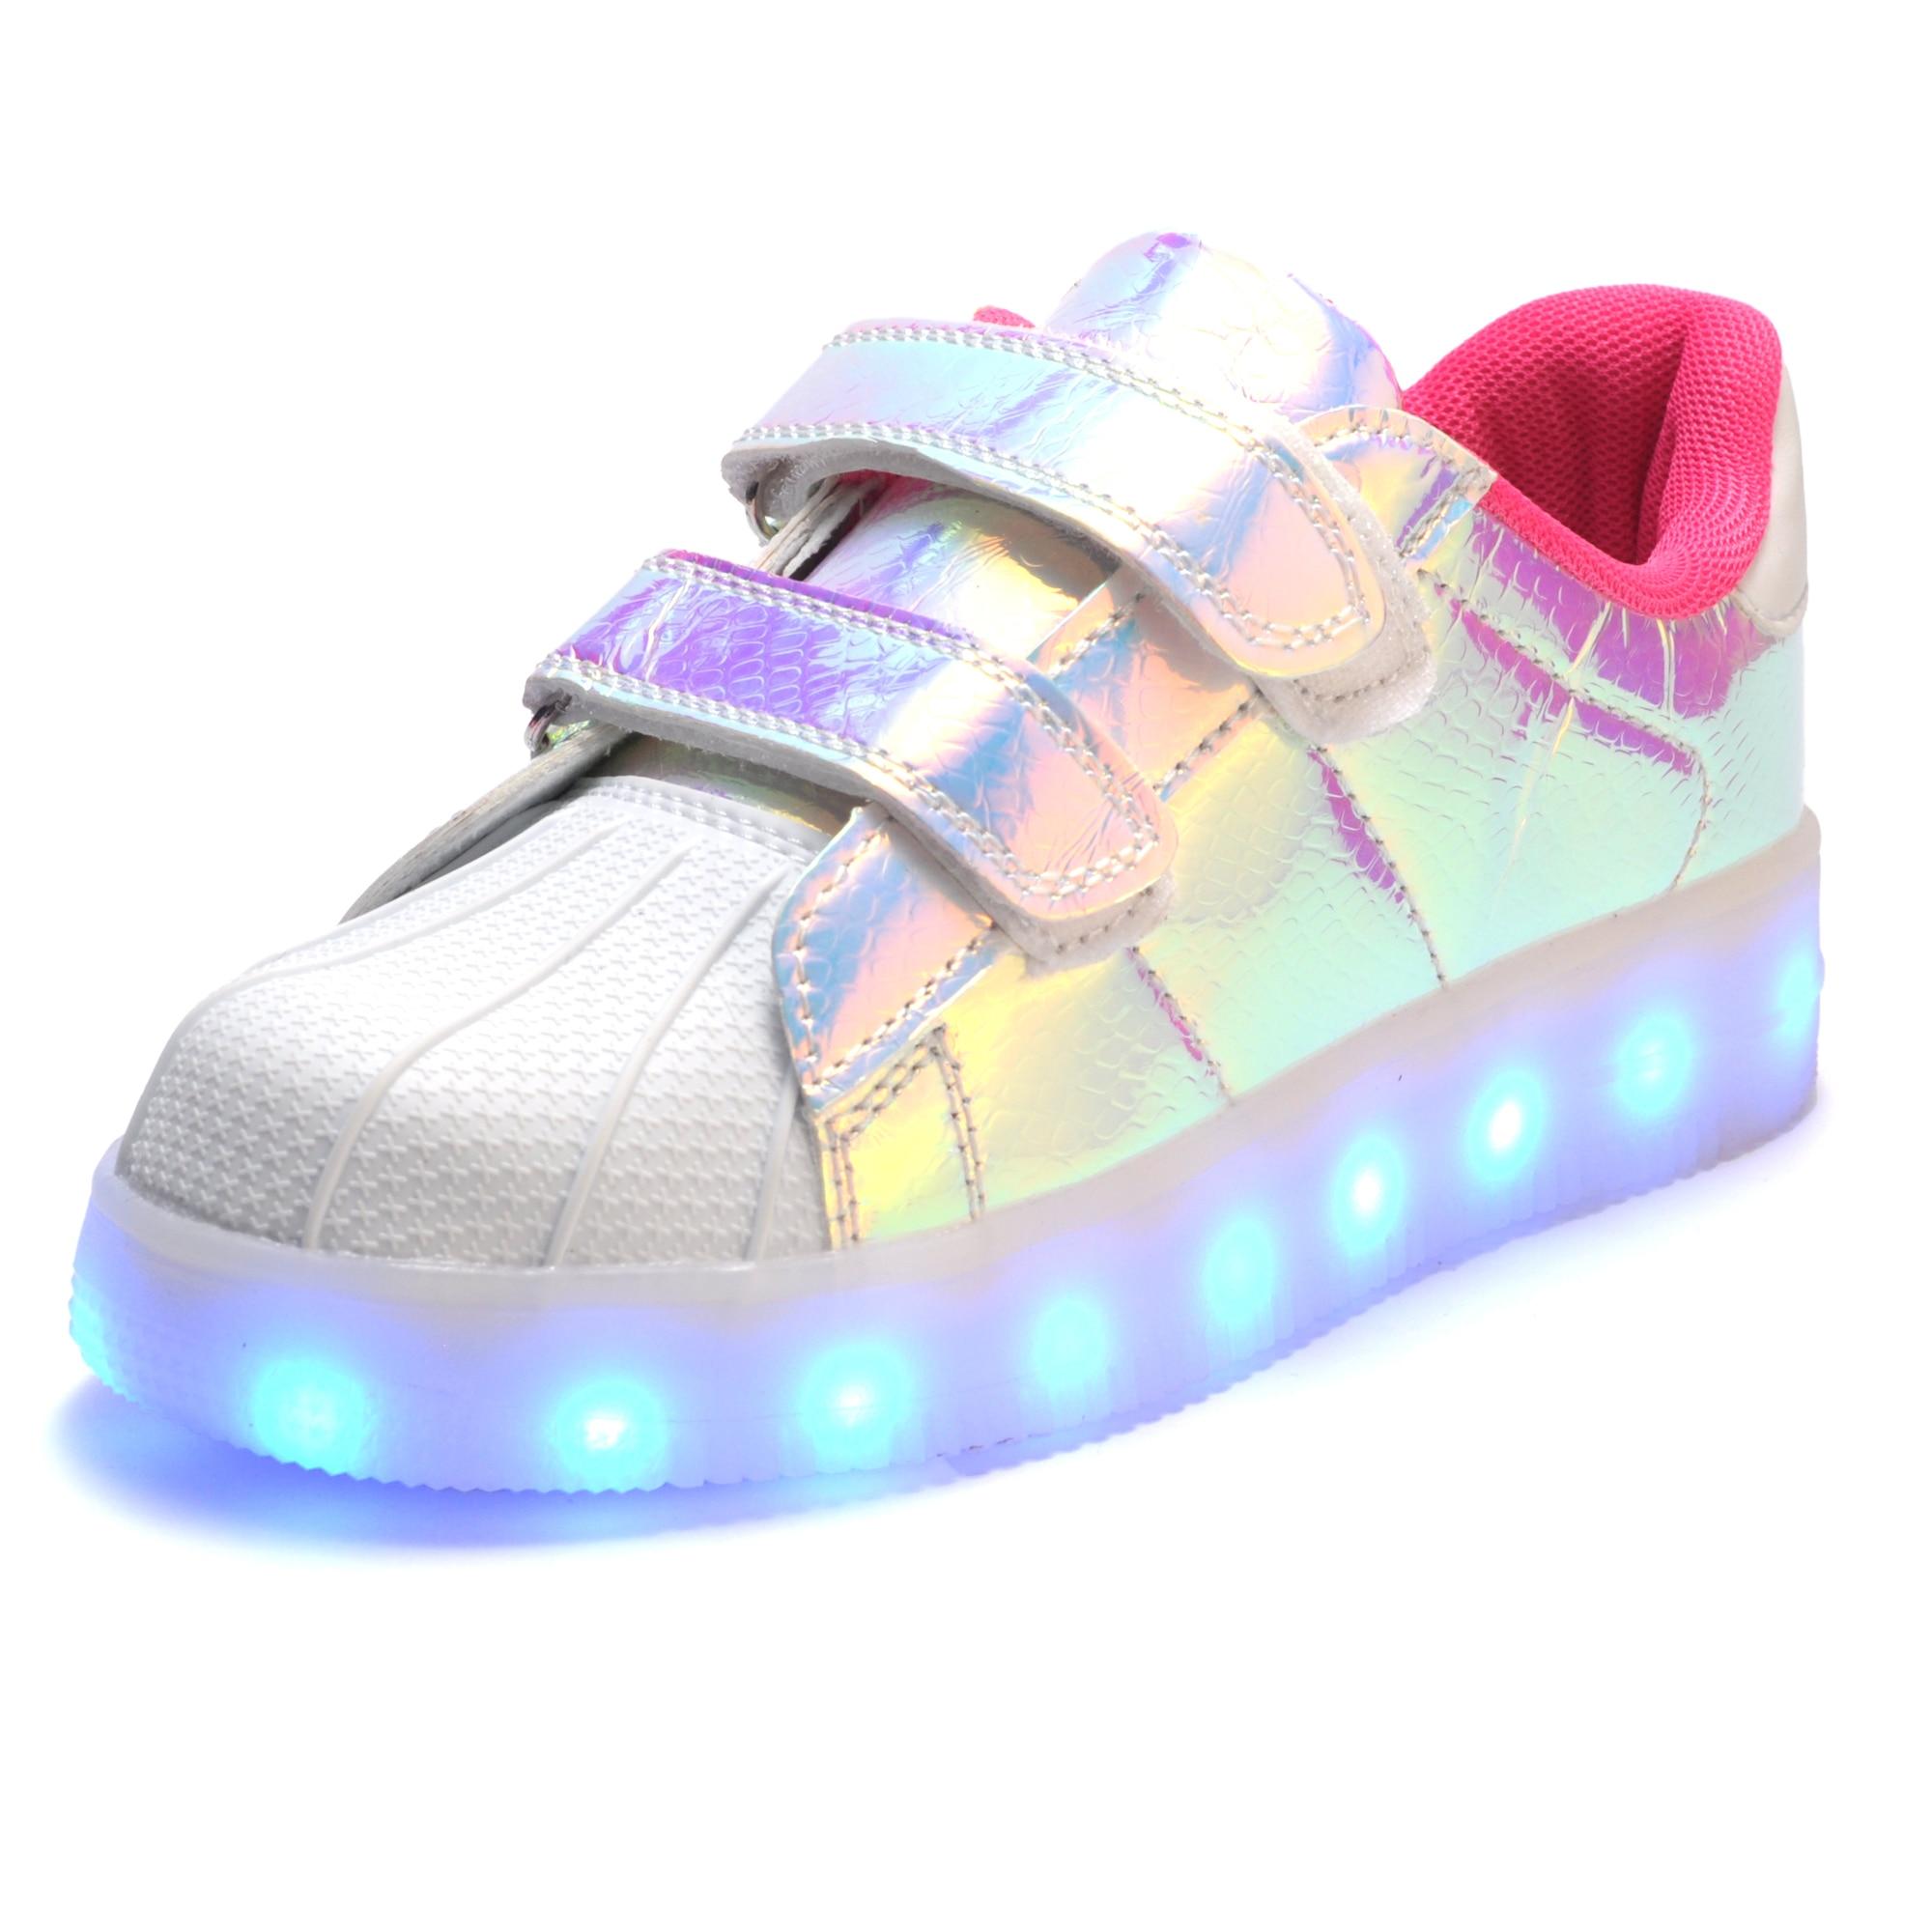 Usb Light Shoes